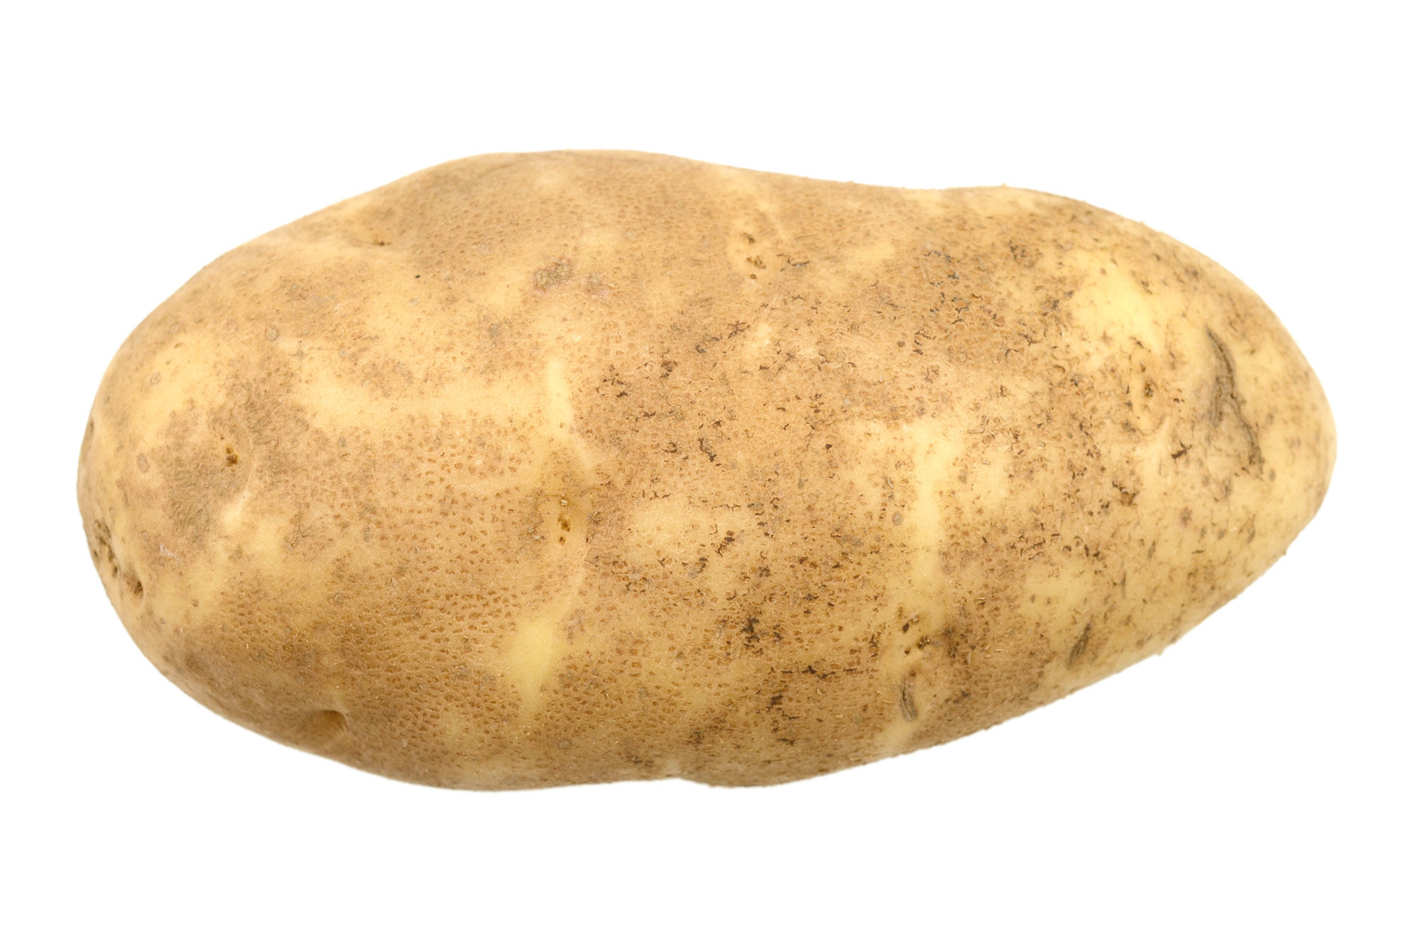 HQ Potato Wallpapers | File 85.89Kb